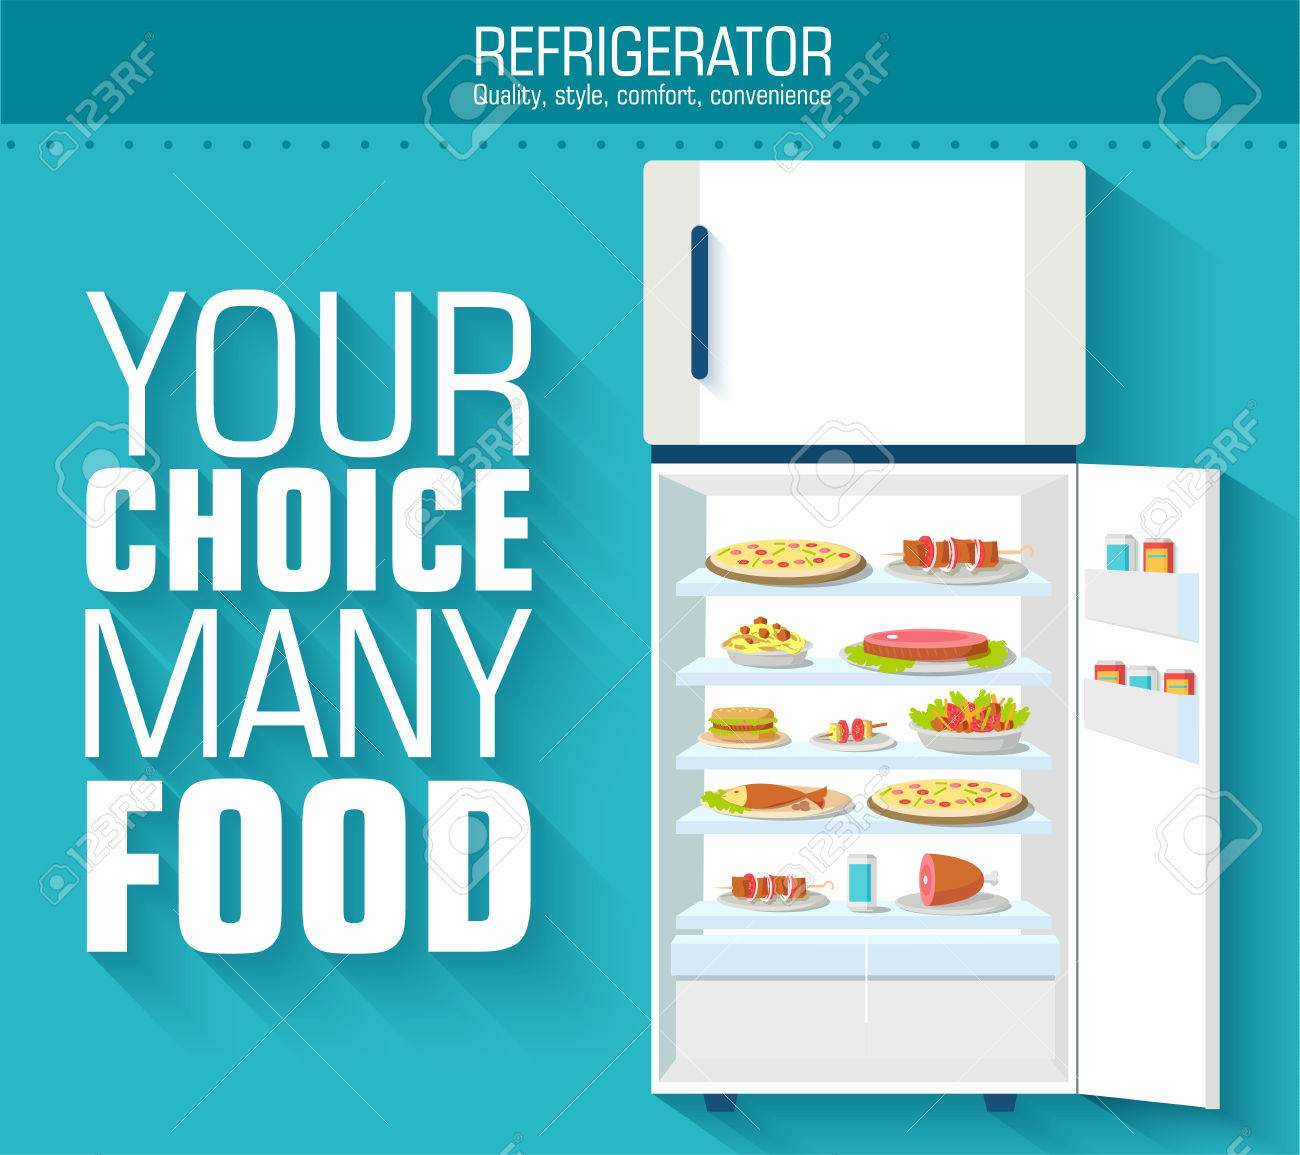 Flat fridge full of many food background concept. Vector illustr - 34292788